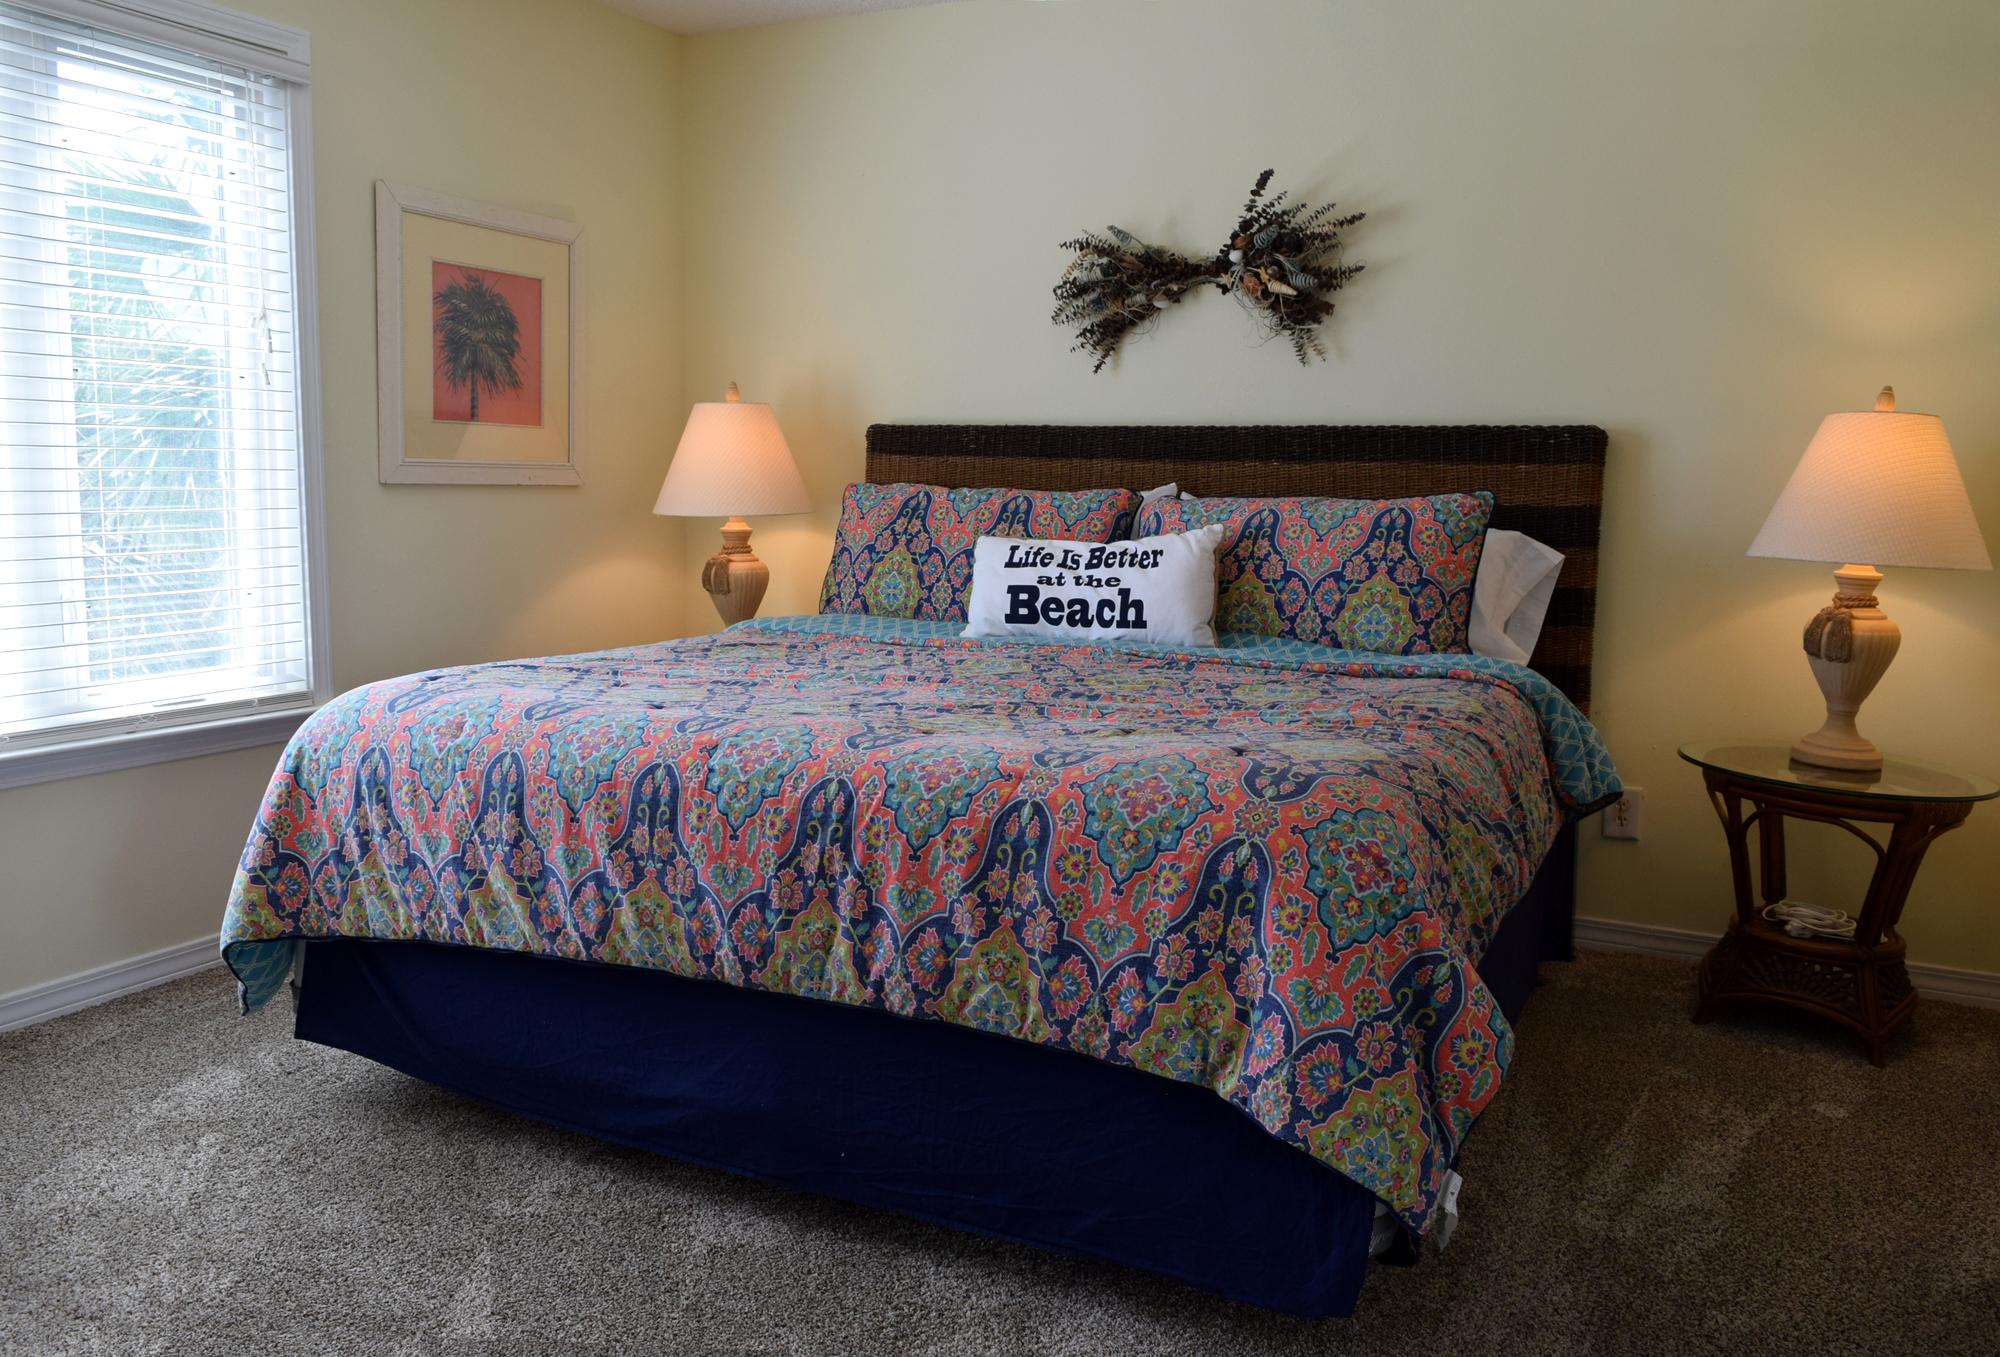 Maldonado 1103 House/Cottage rental in Pensacola Beach House Rentals in Pensacola Beach Florida - #11